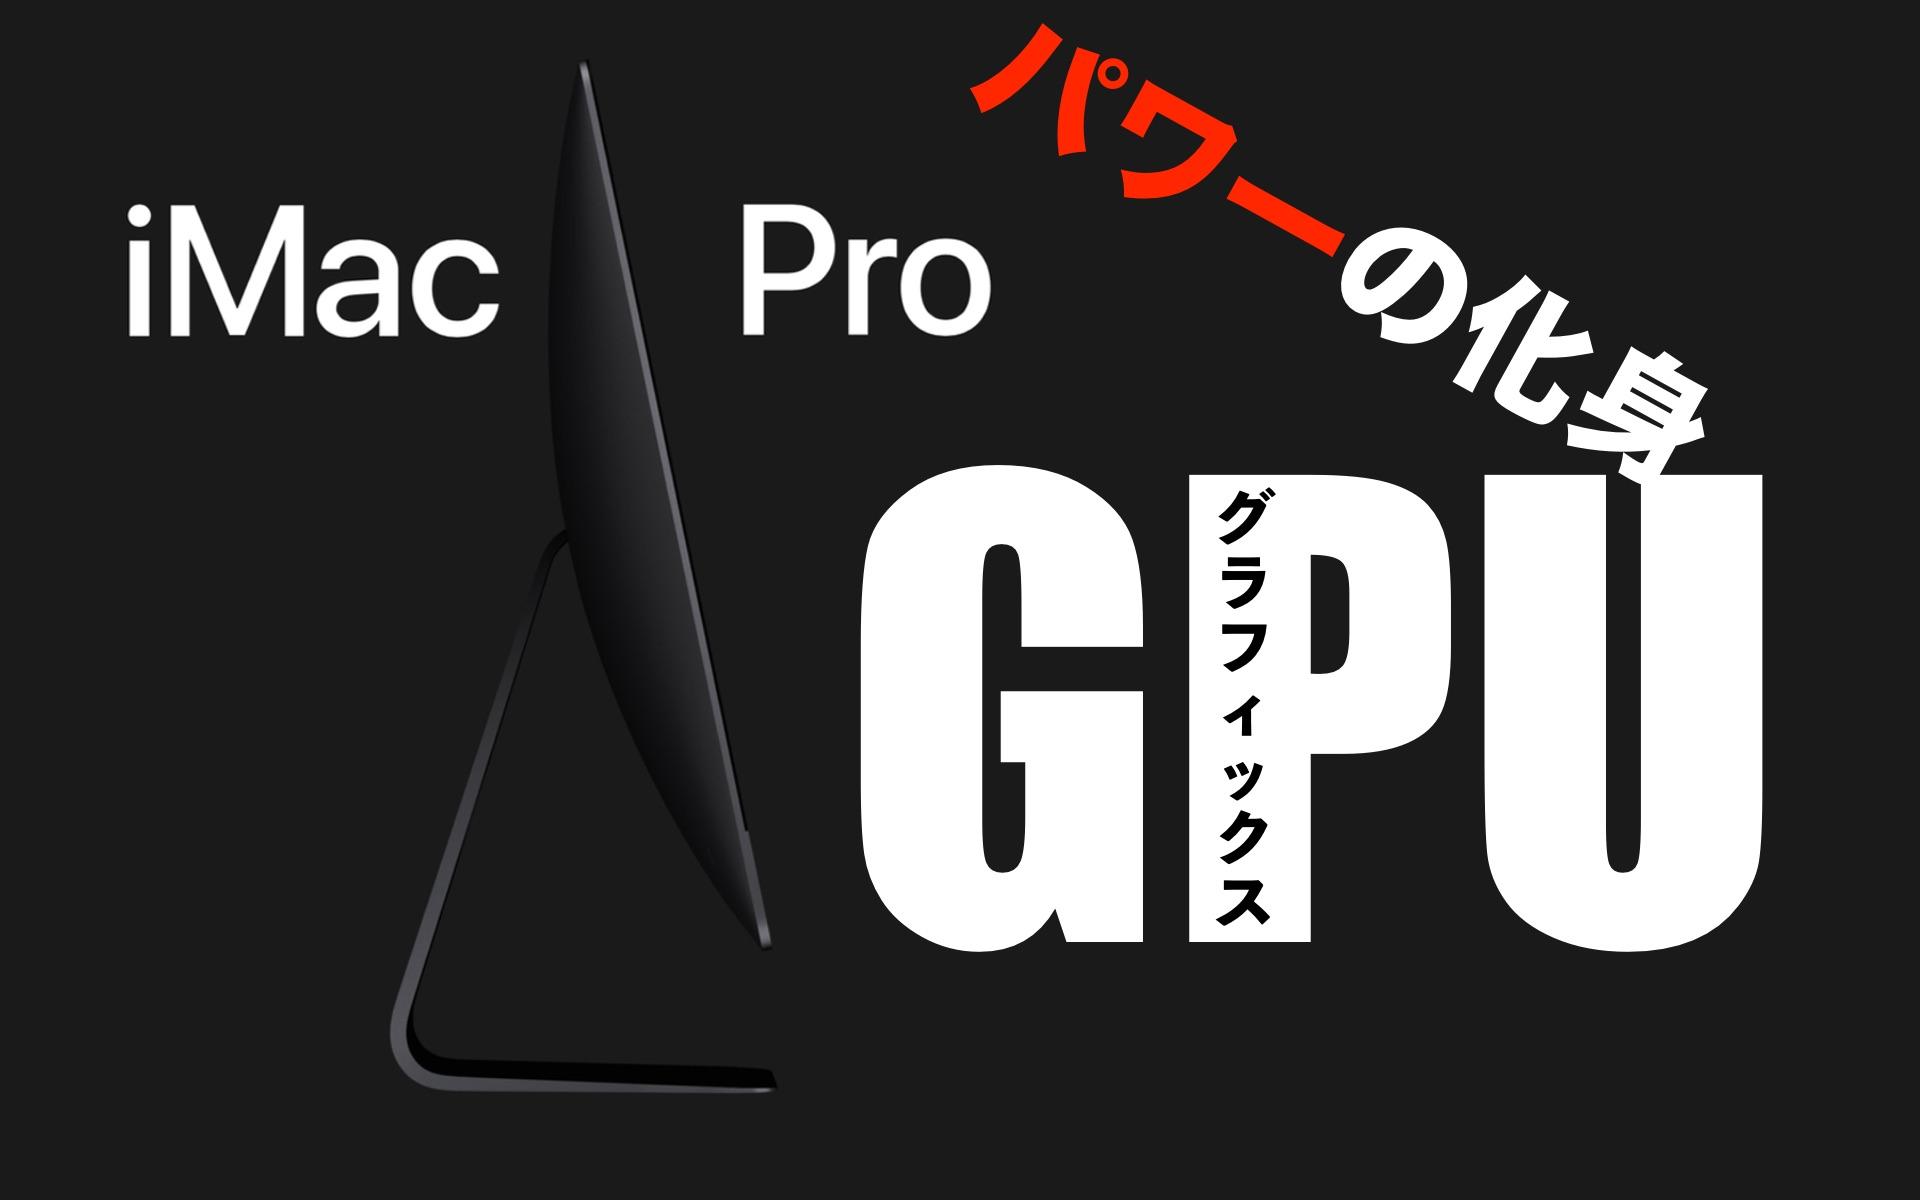 iMac ProのGPUについての記事のアイキャッチ